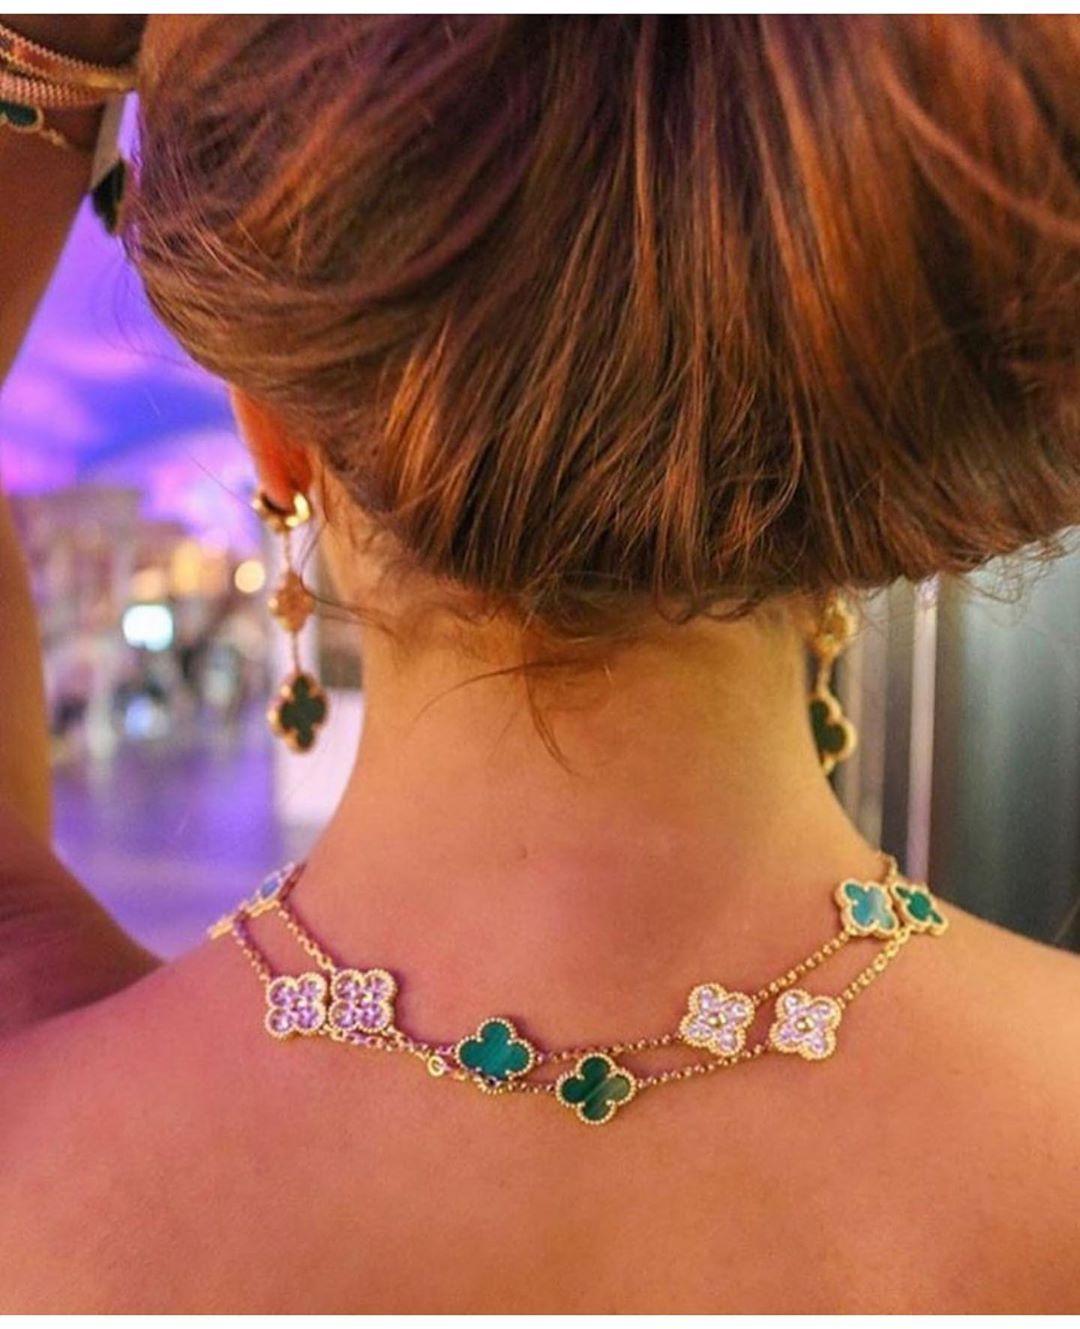 هلا باللي عجزت ألقى عذاريبه Jewelry Jewelrydesigner Brand Diamonds Diamondring Fancydiamond Styleblogger Diamondnecklace Cartier Harry Winston